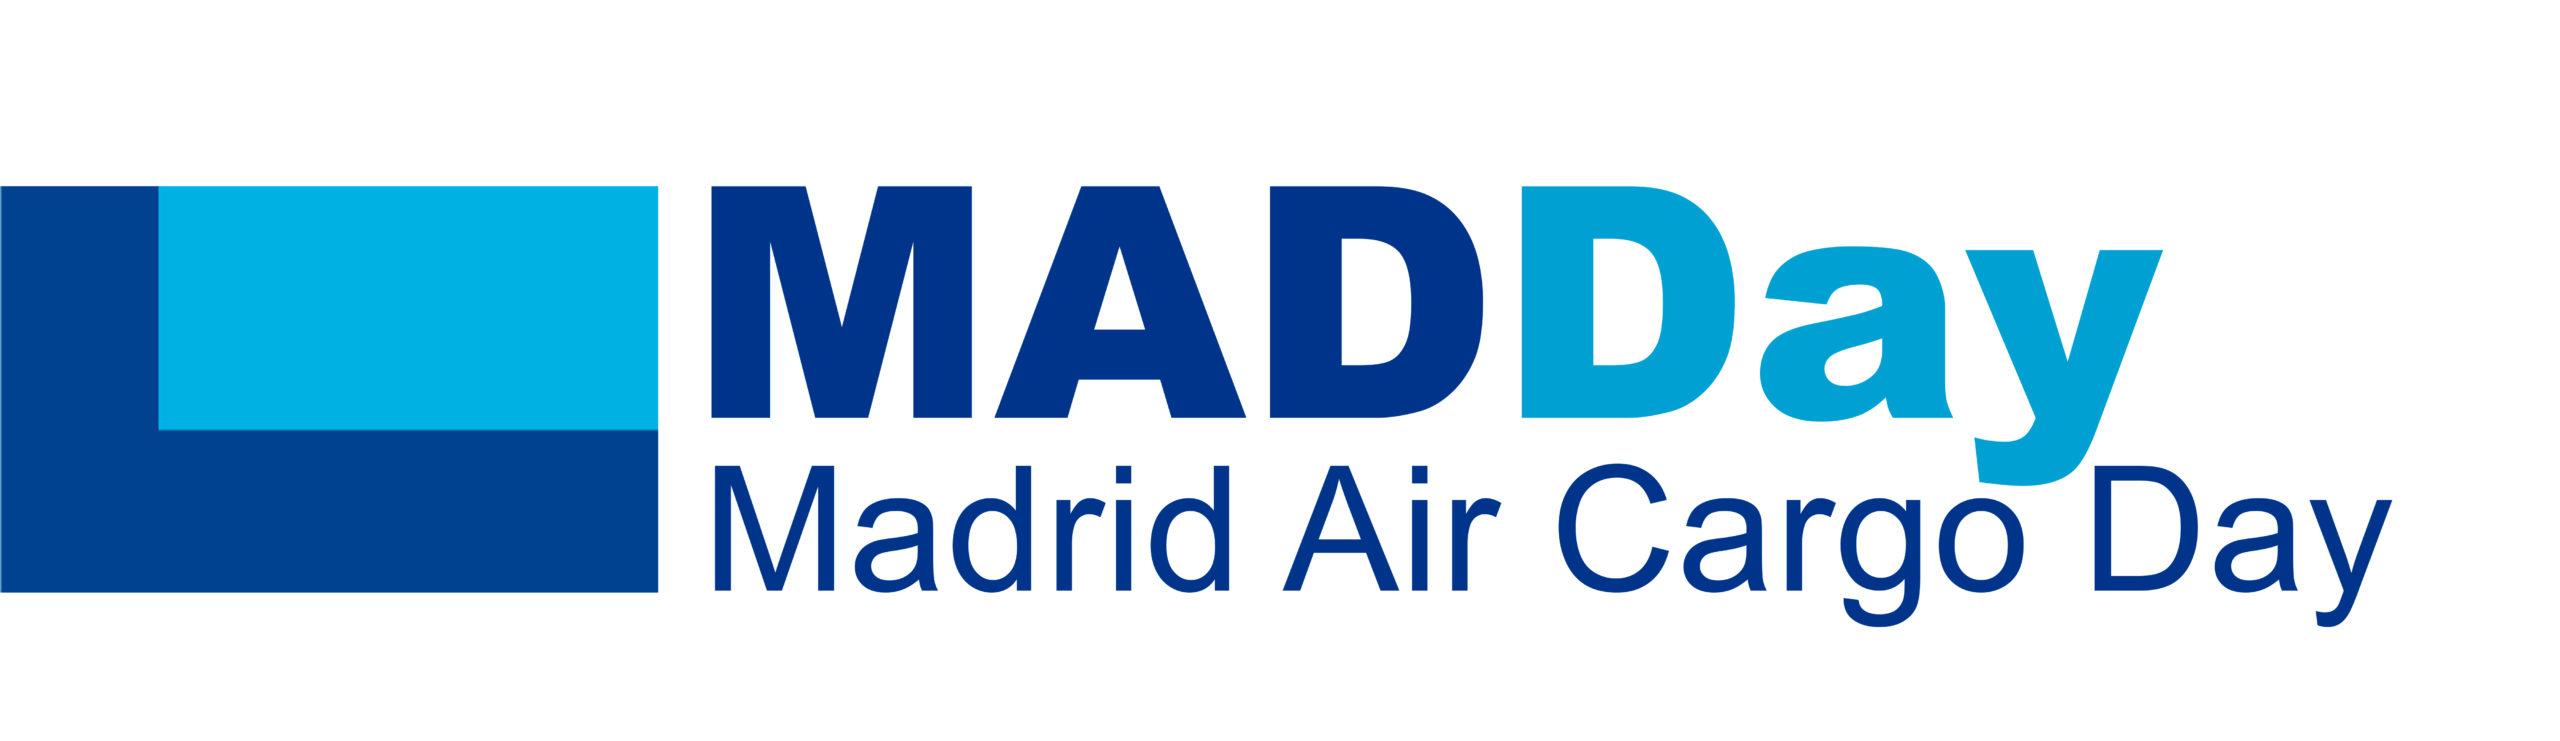 Madrid Air Cargo Day